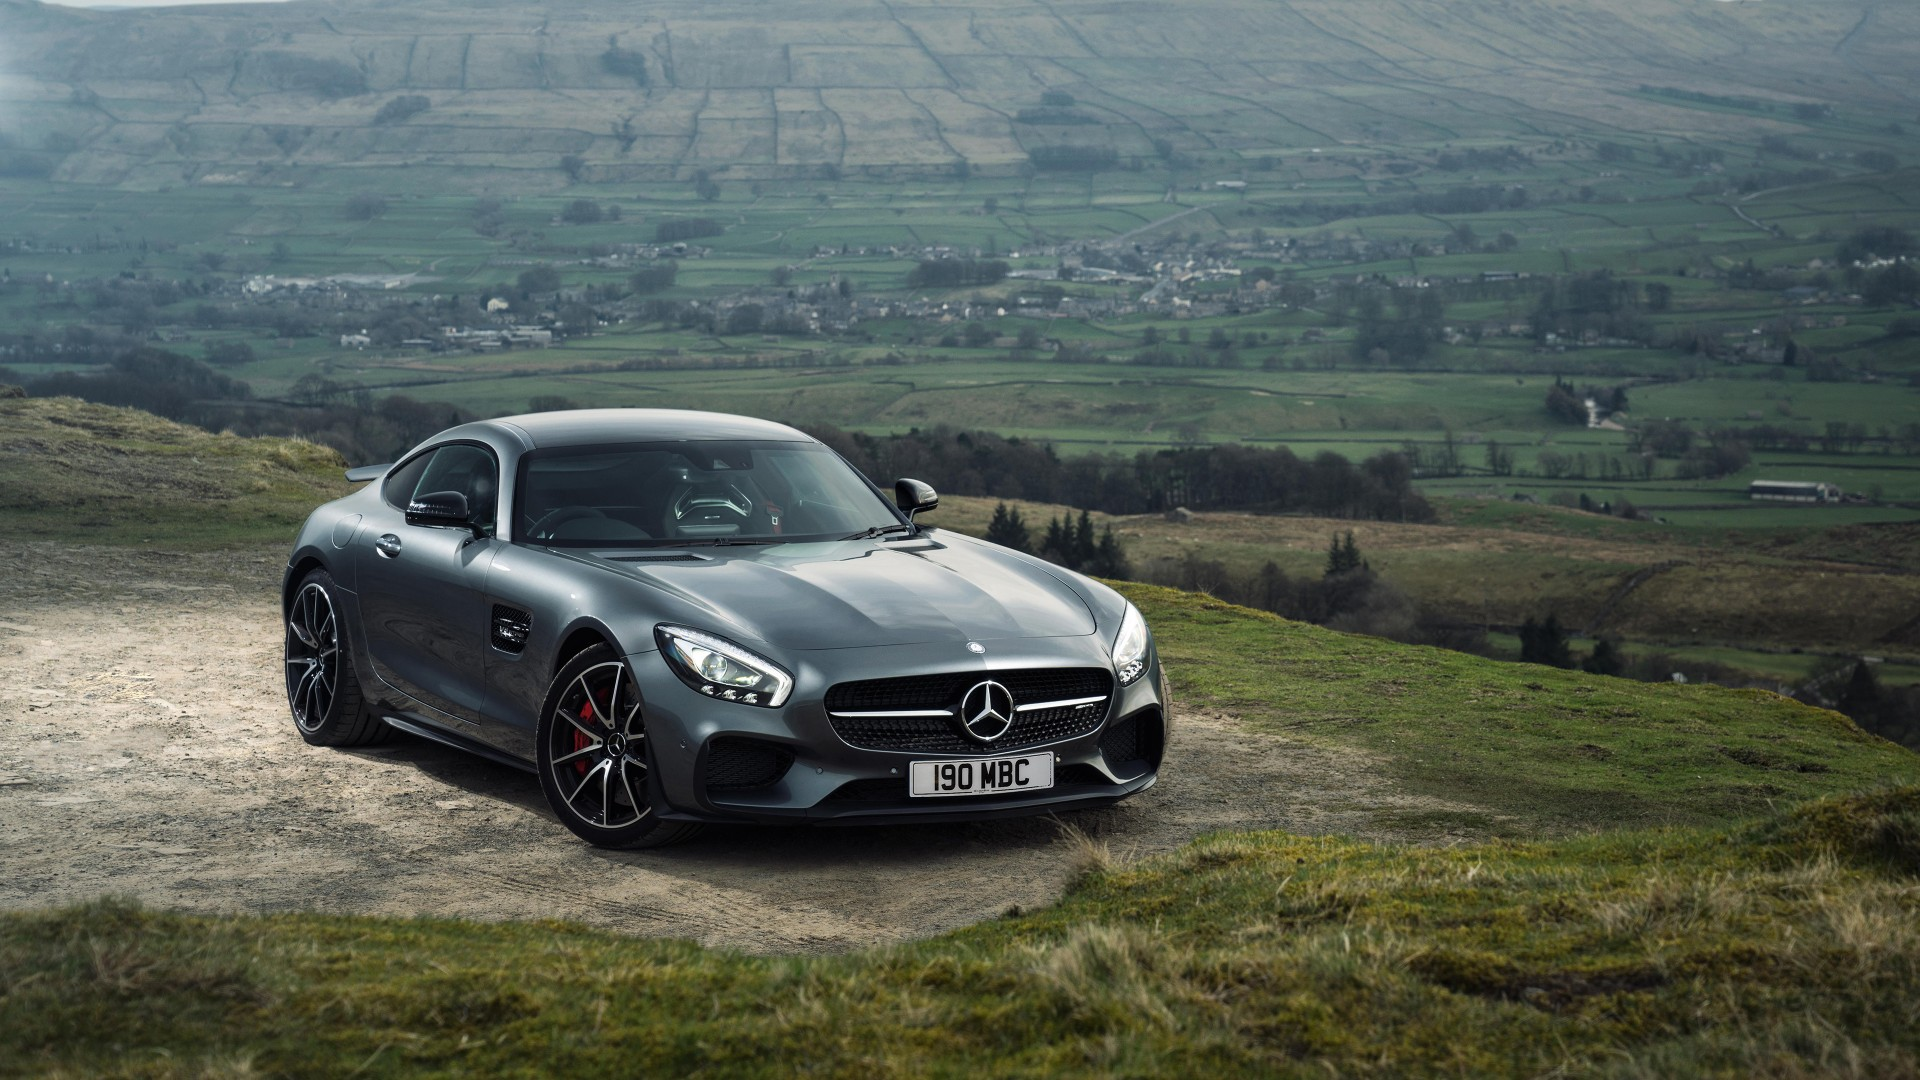 Mercedes AMG GT S 2015 Wallpaper | HD Car Wallpapers | ID ...